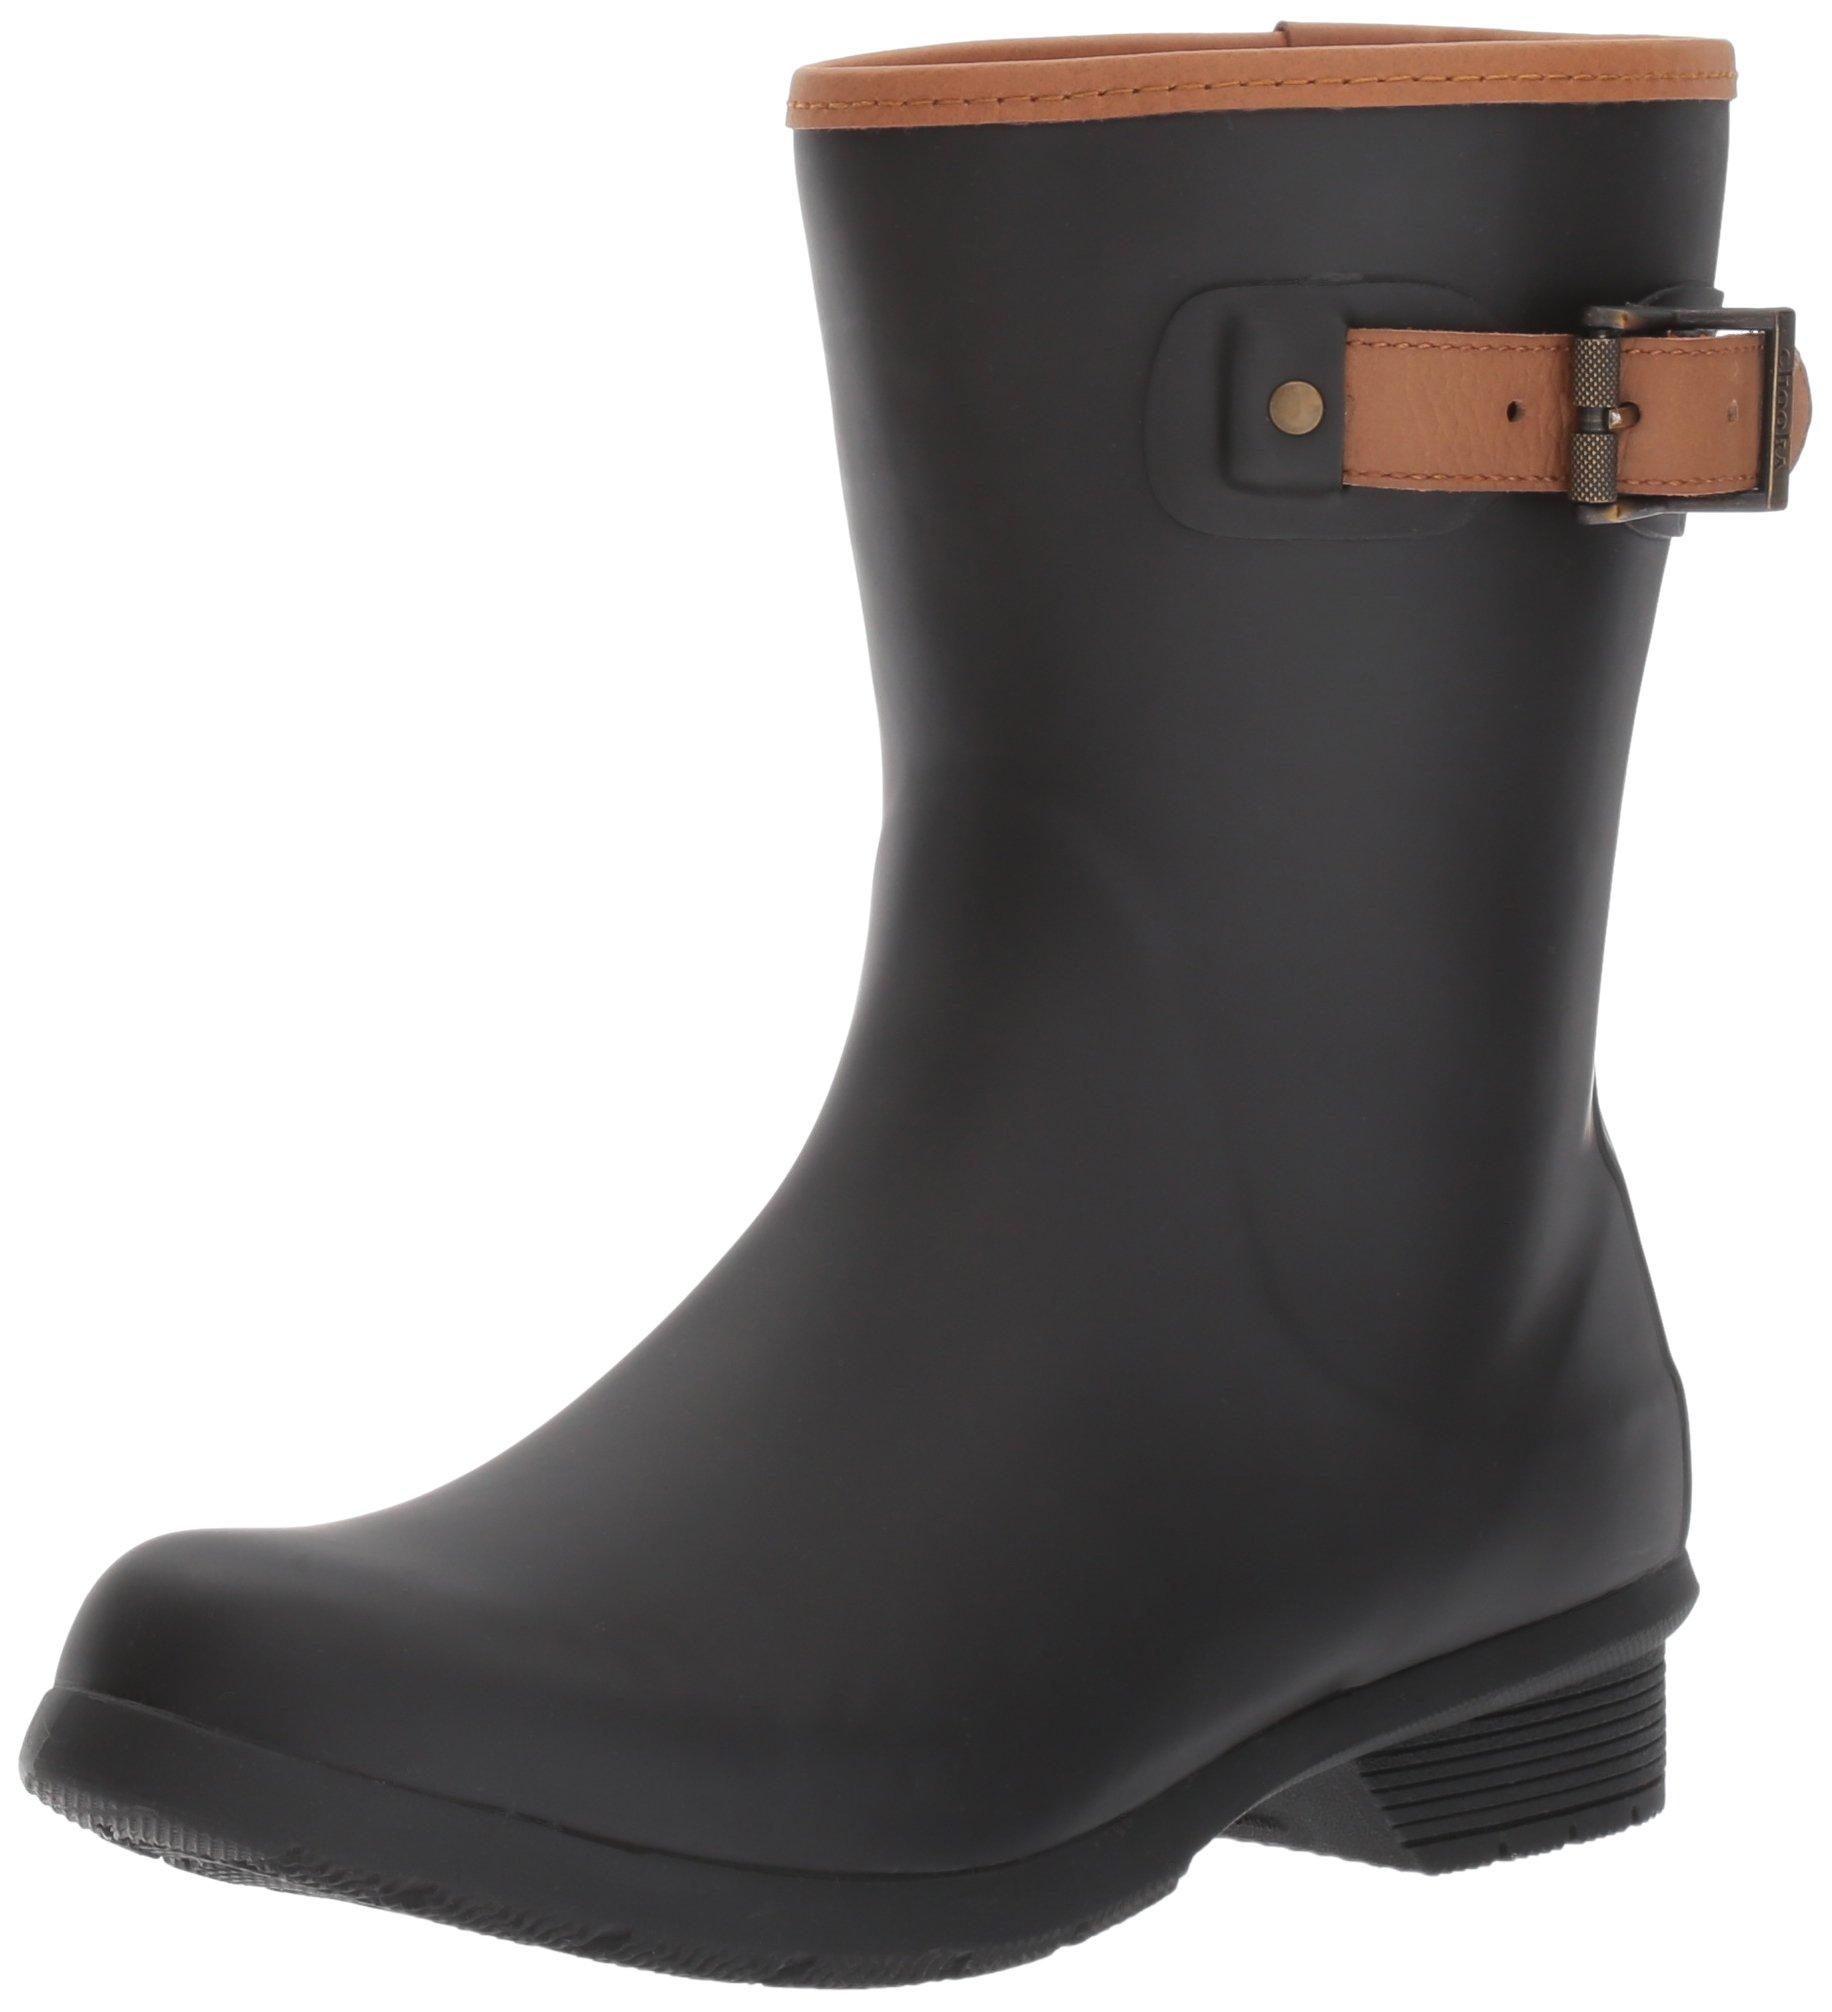 Chooka Women's Mid-Height Memory Foam Rain Boot, Black, 8 M US